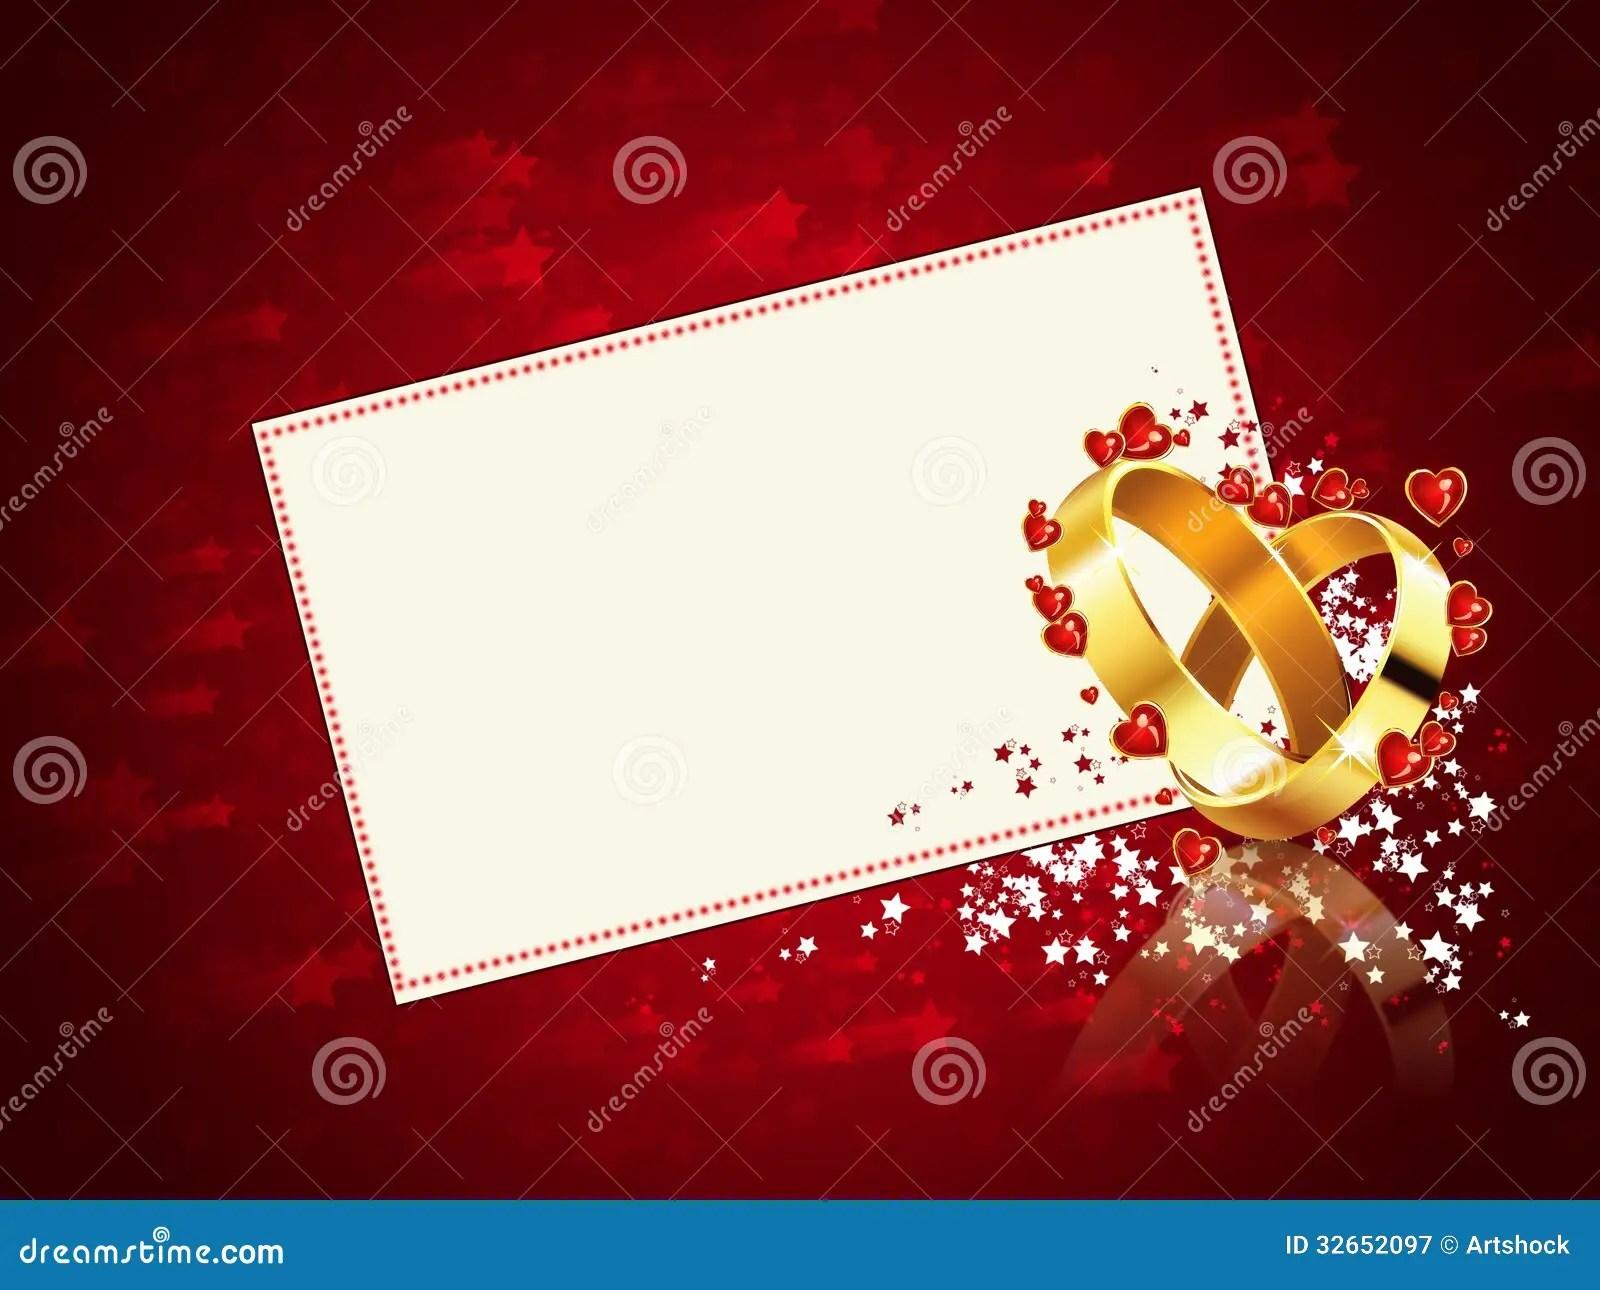 Ring Ceremony Hd Wallpaper Romantic Wedding Card Stock Illustration Image Of Golden